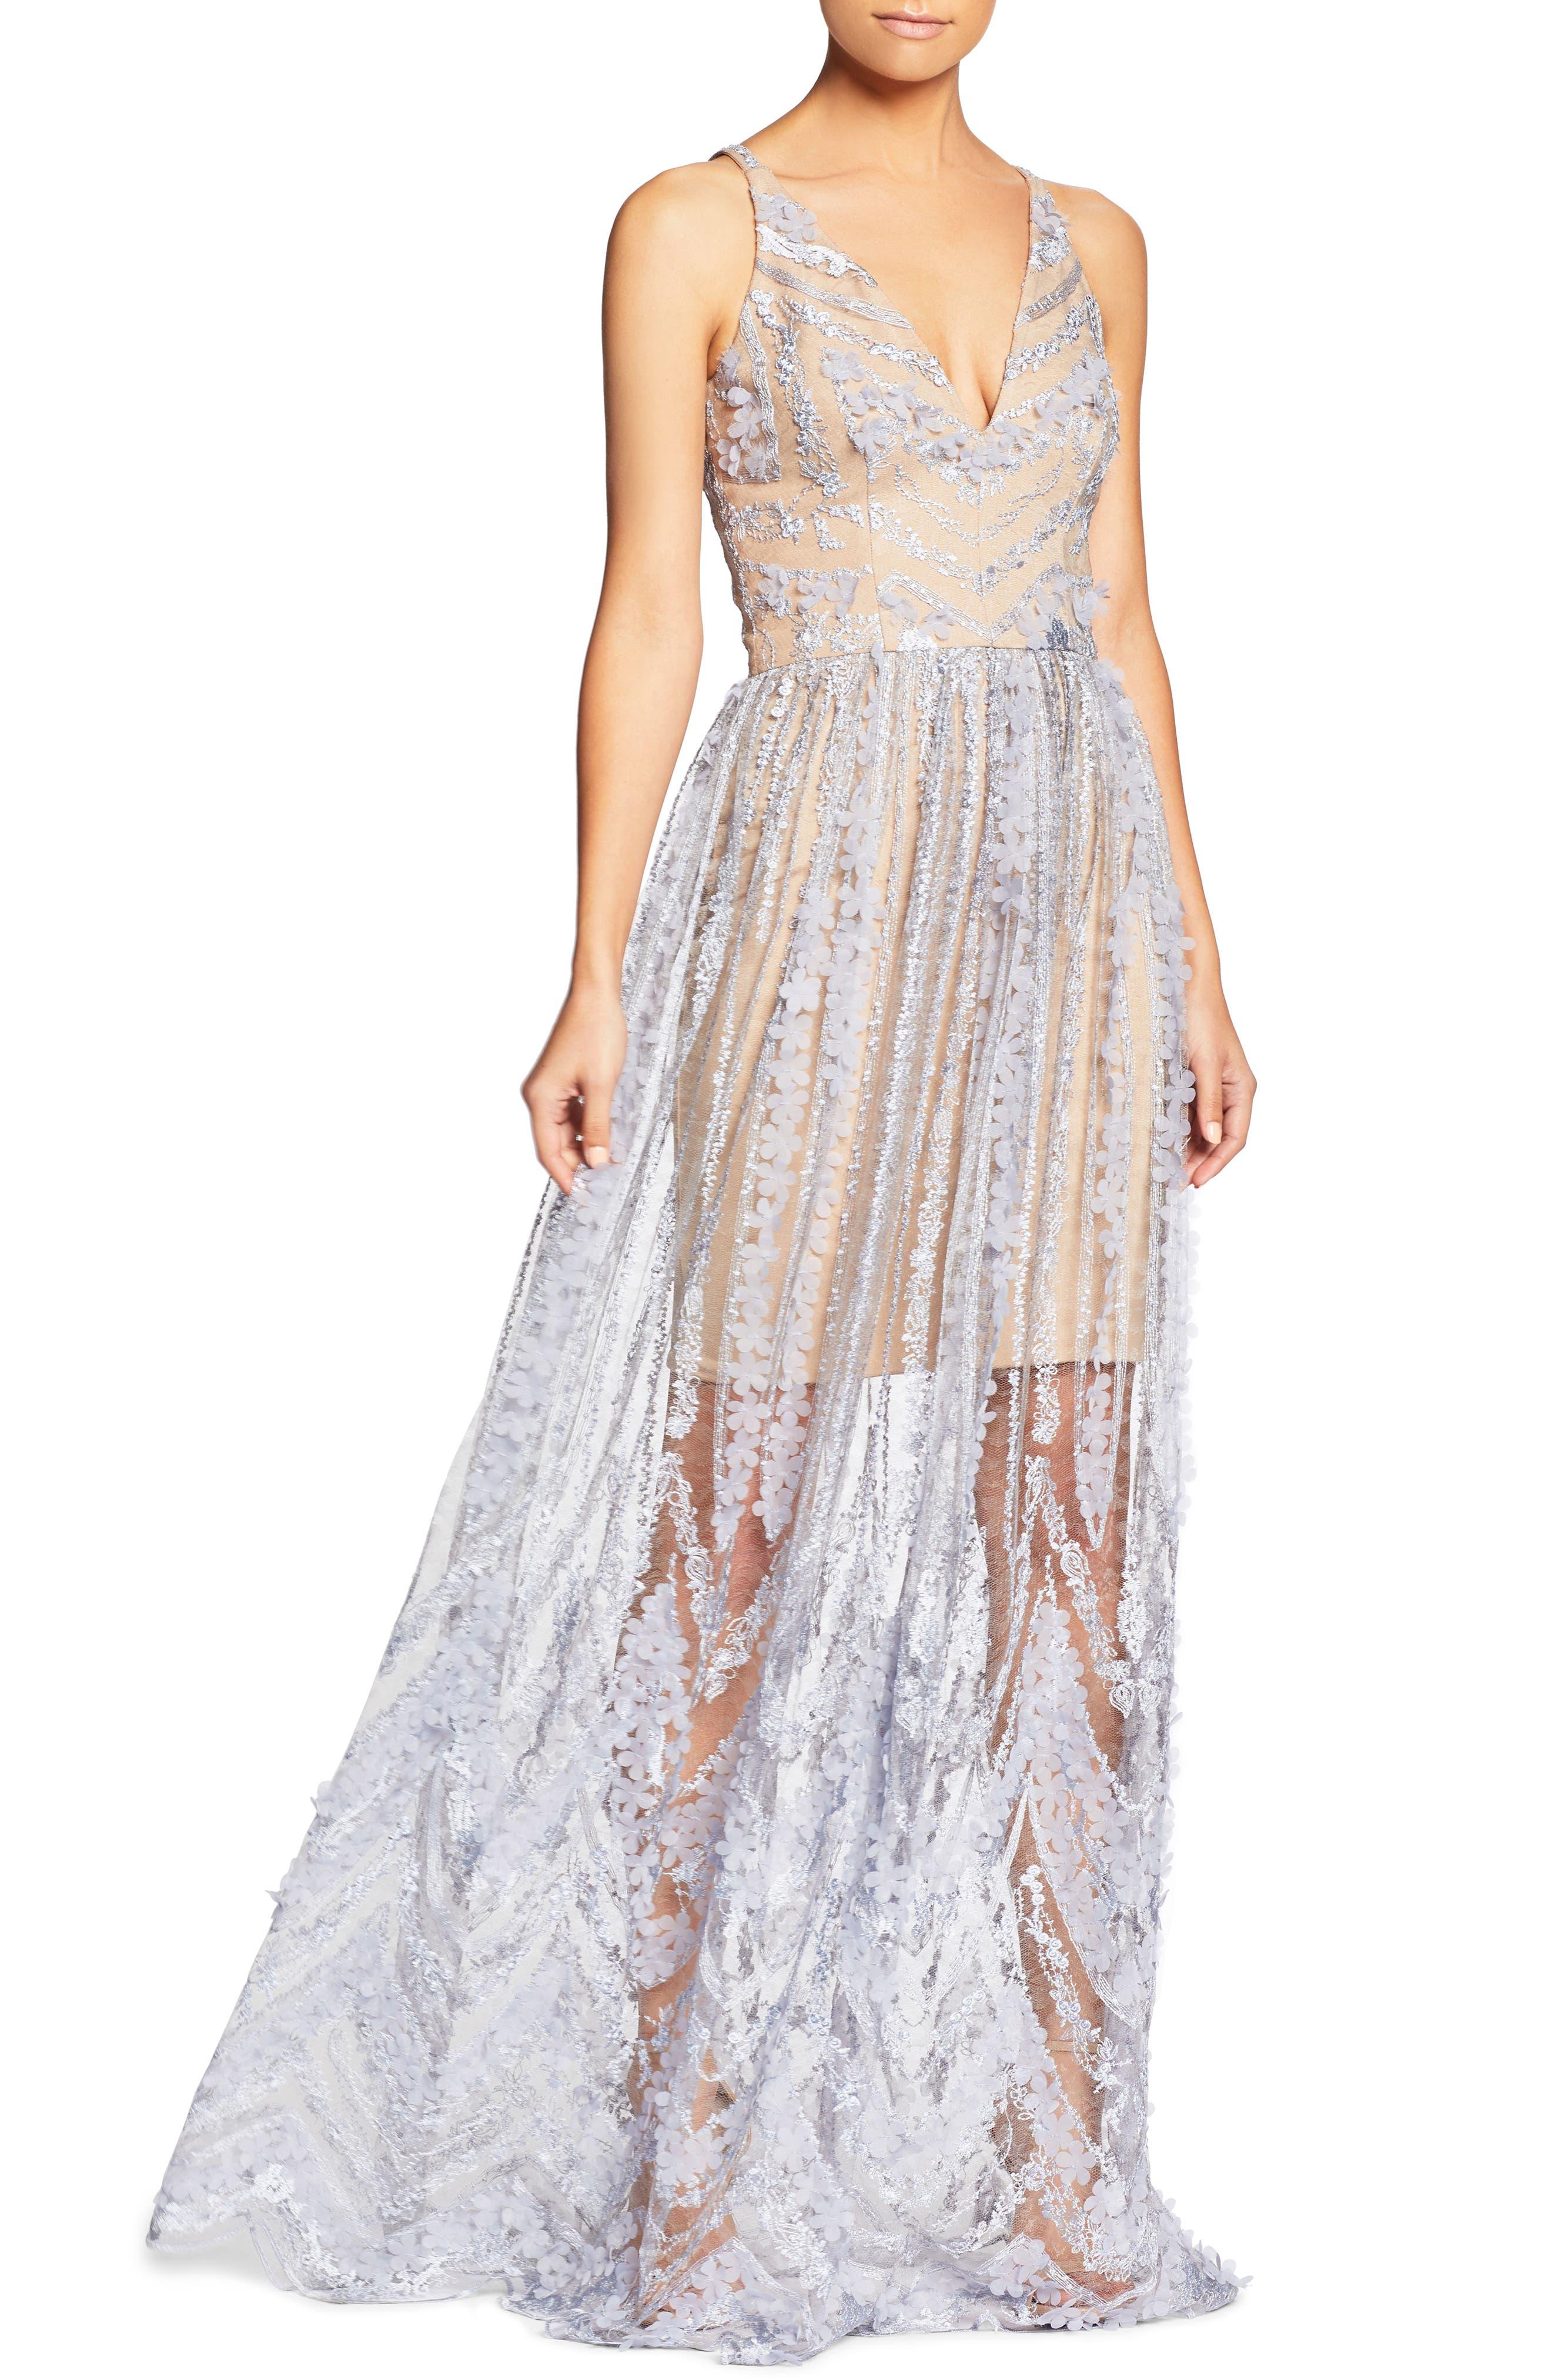 dresses for prom 2018 in miami